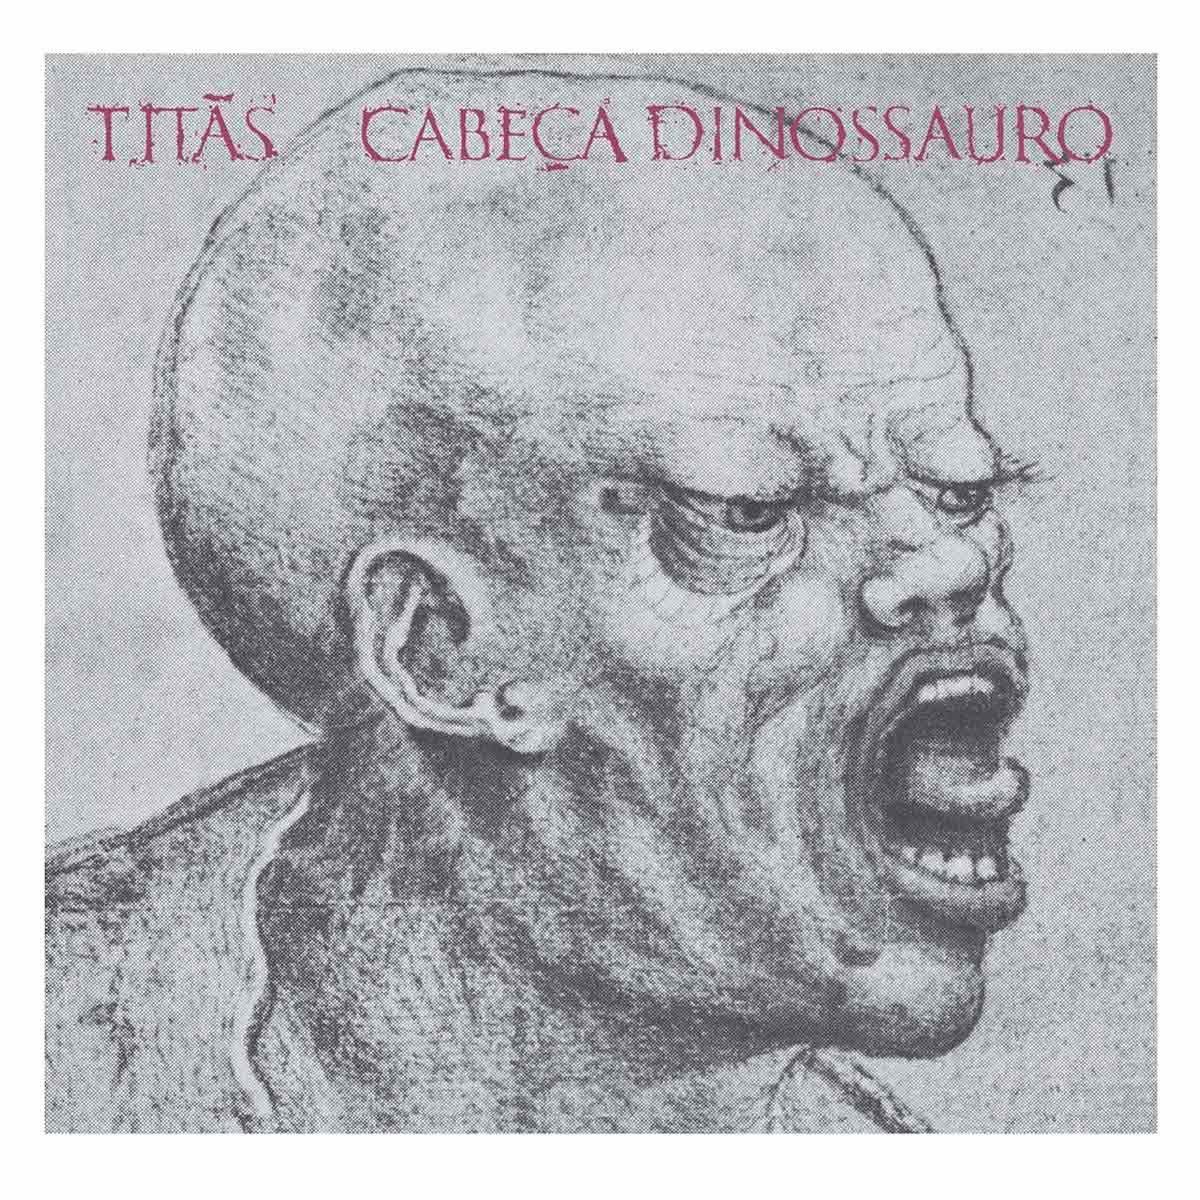 LP Titãs Cabeça Dinossauro  - bandUP Store Marketplace